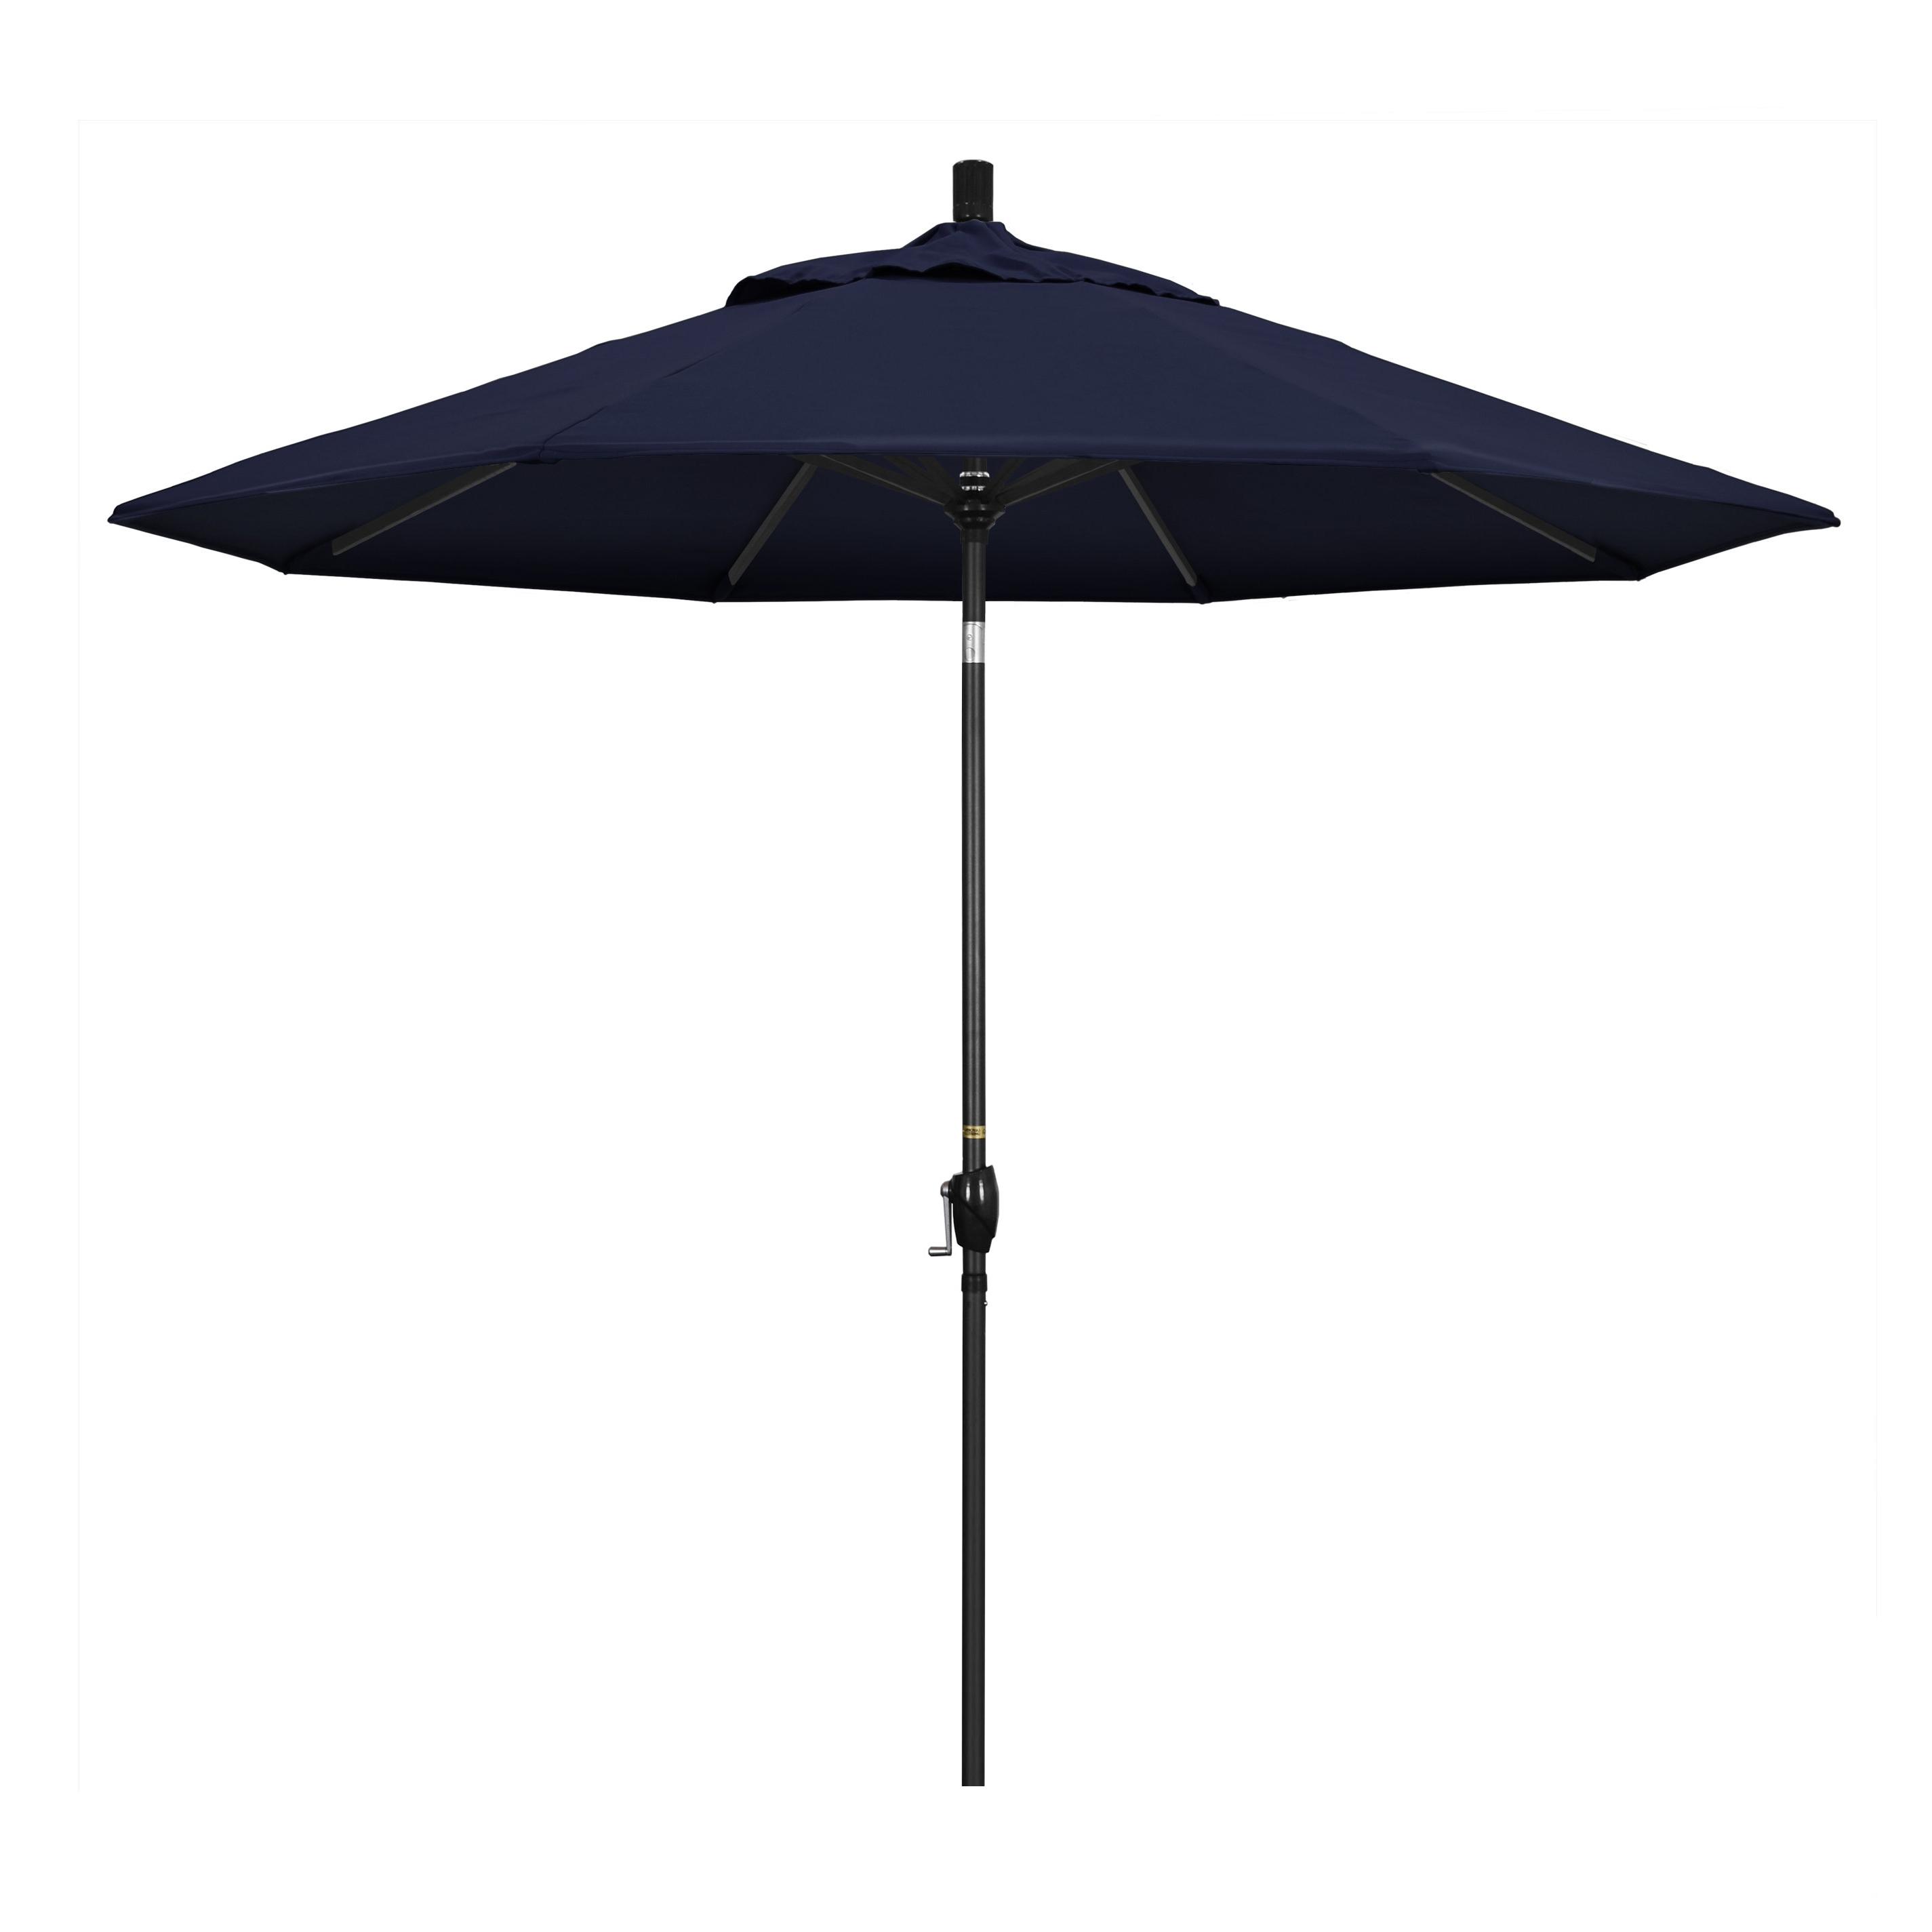 Well Known 9' Market Umbrella With Priscilla Market Umbrellas (View 13 of 20)